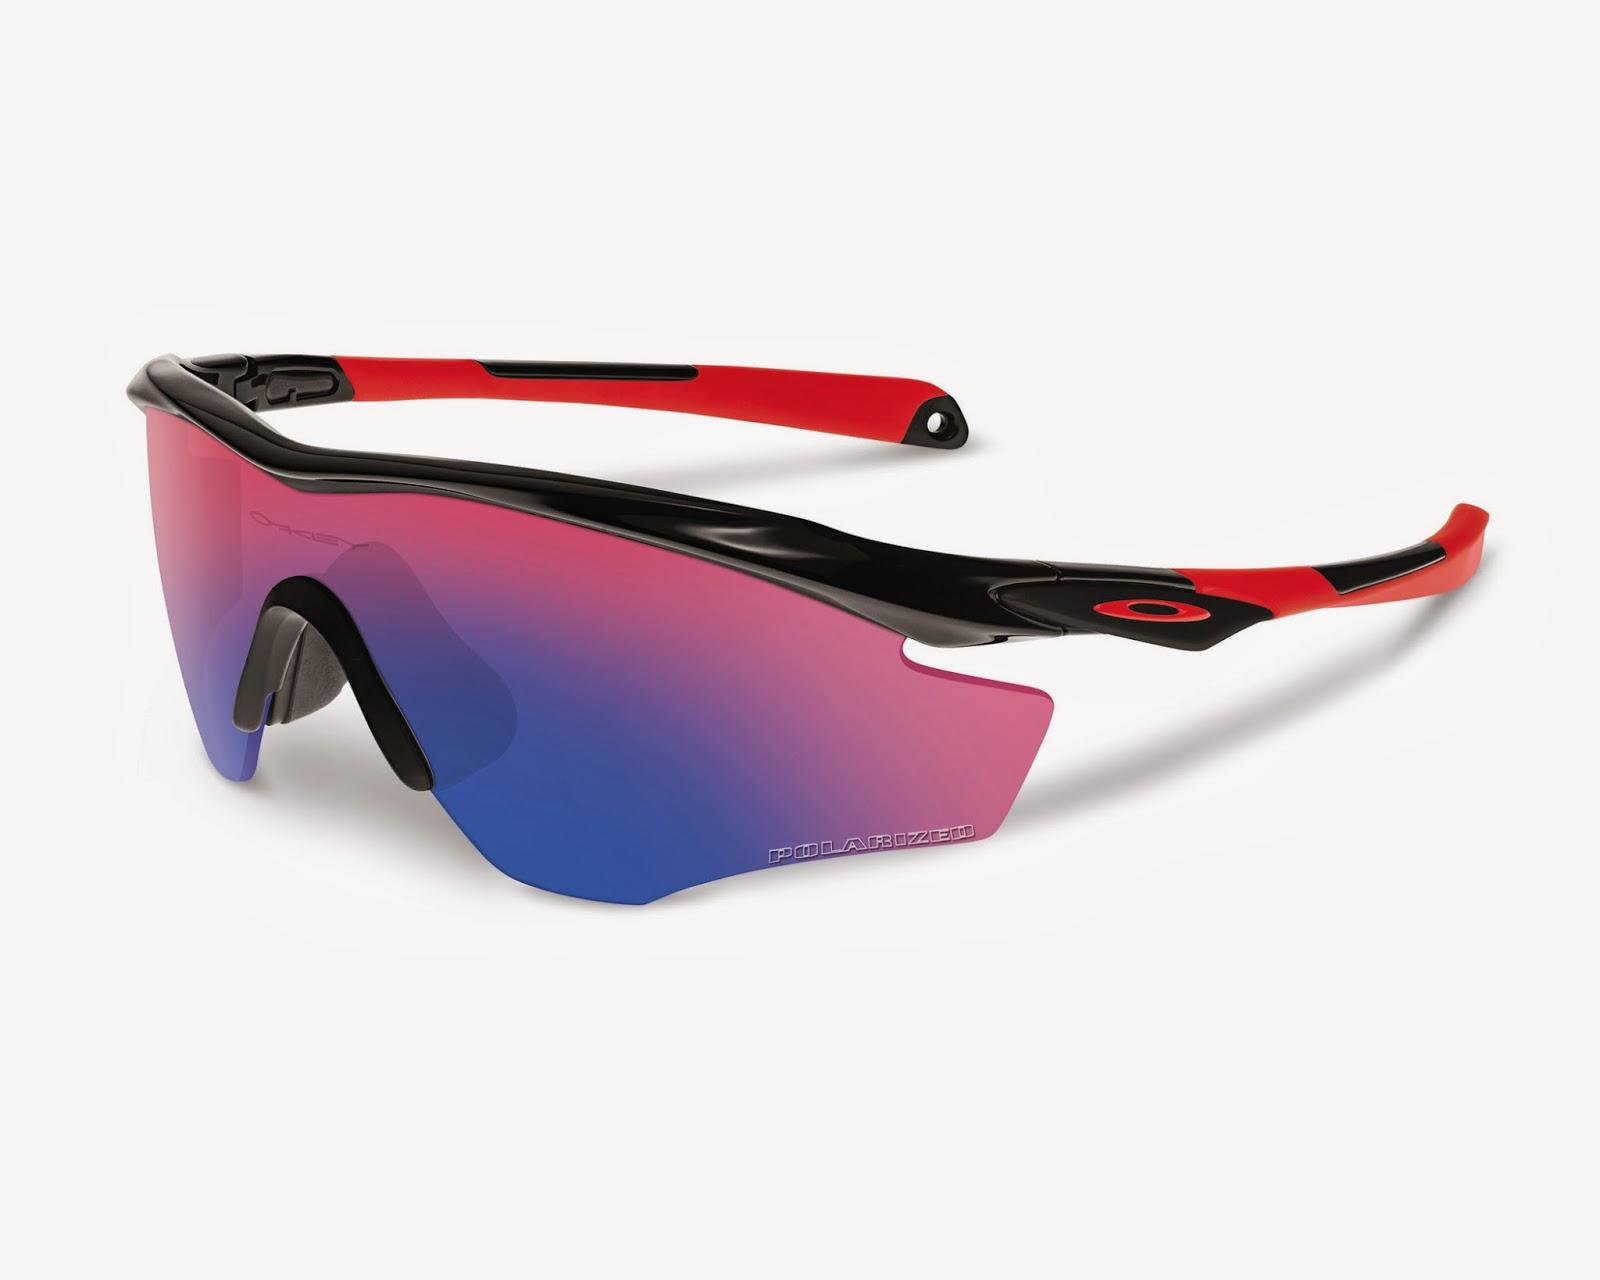 02f9dcefe1452 Oakley lança novos óculos de sol para performance – Corrida 4Fun